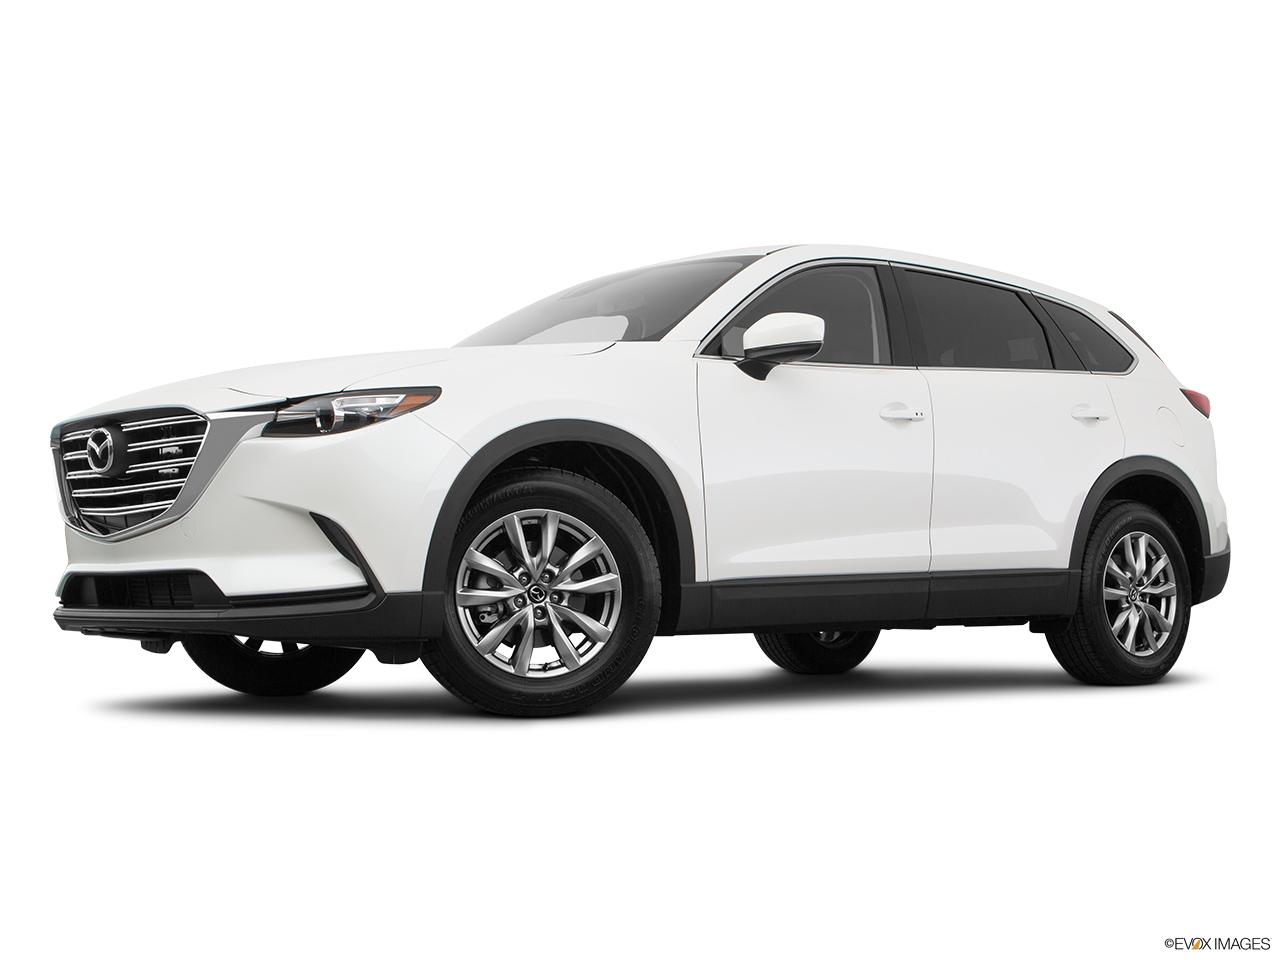 Kekurangan Mazda Xc9 Perbandingan Harga